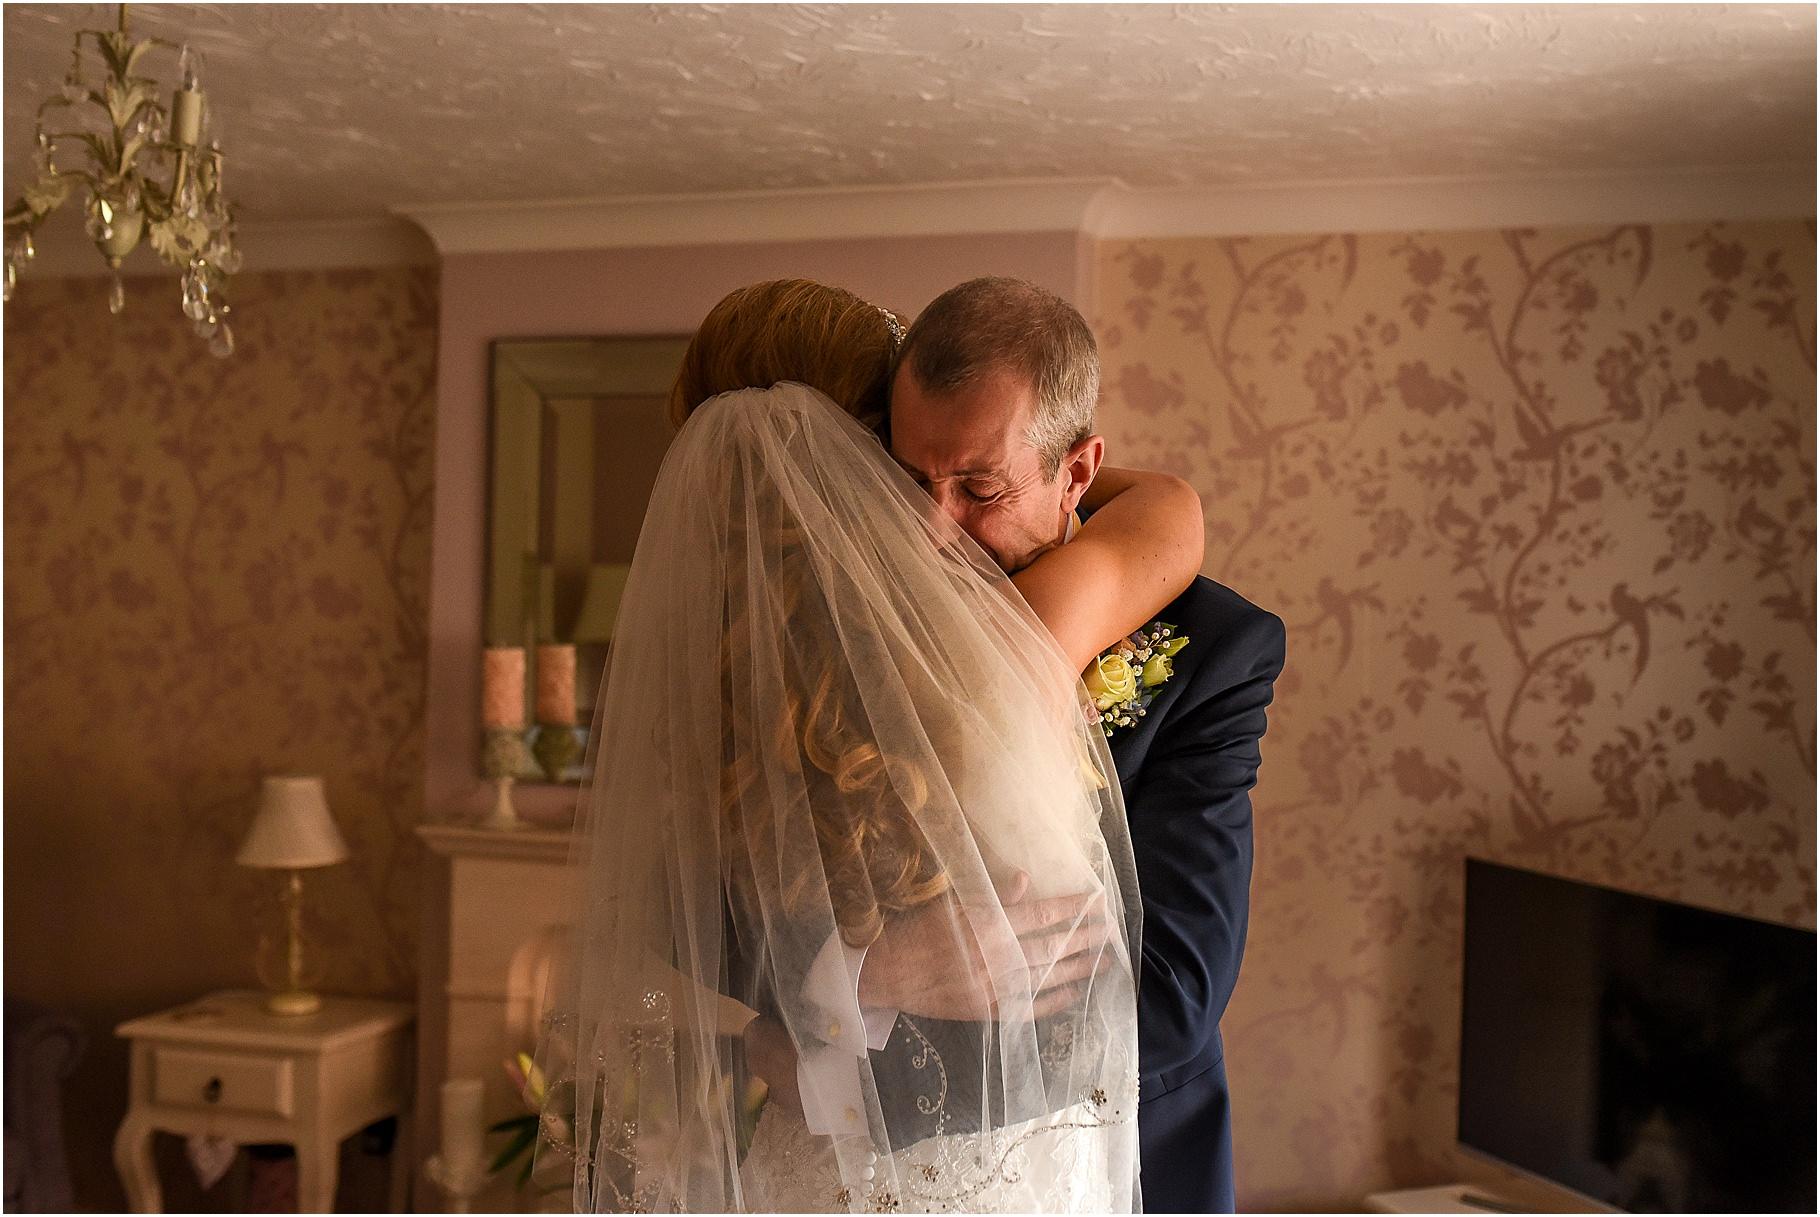 dan-wootton-photography-2017-weddings-160.jpg